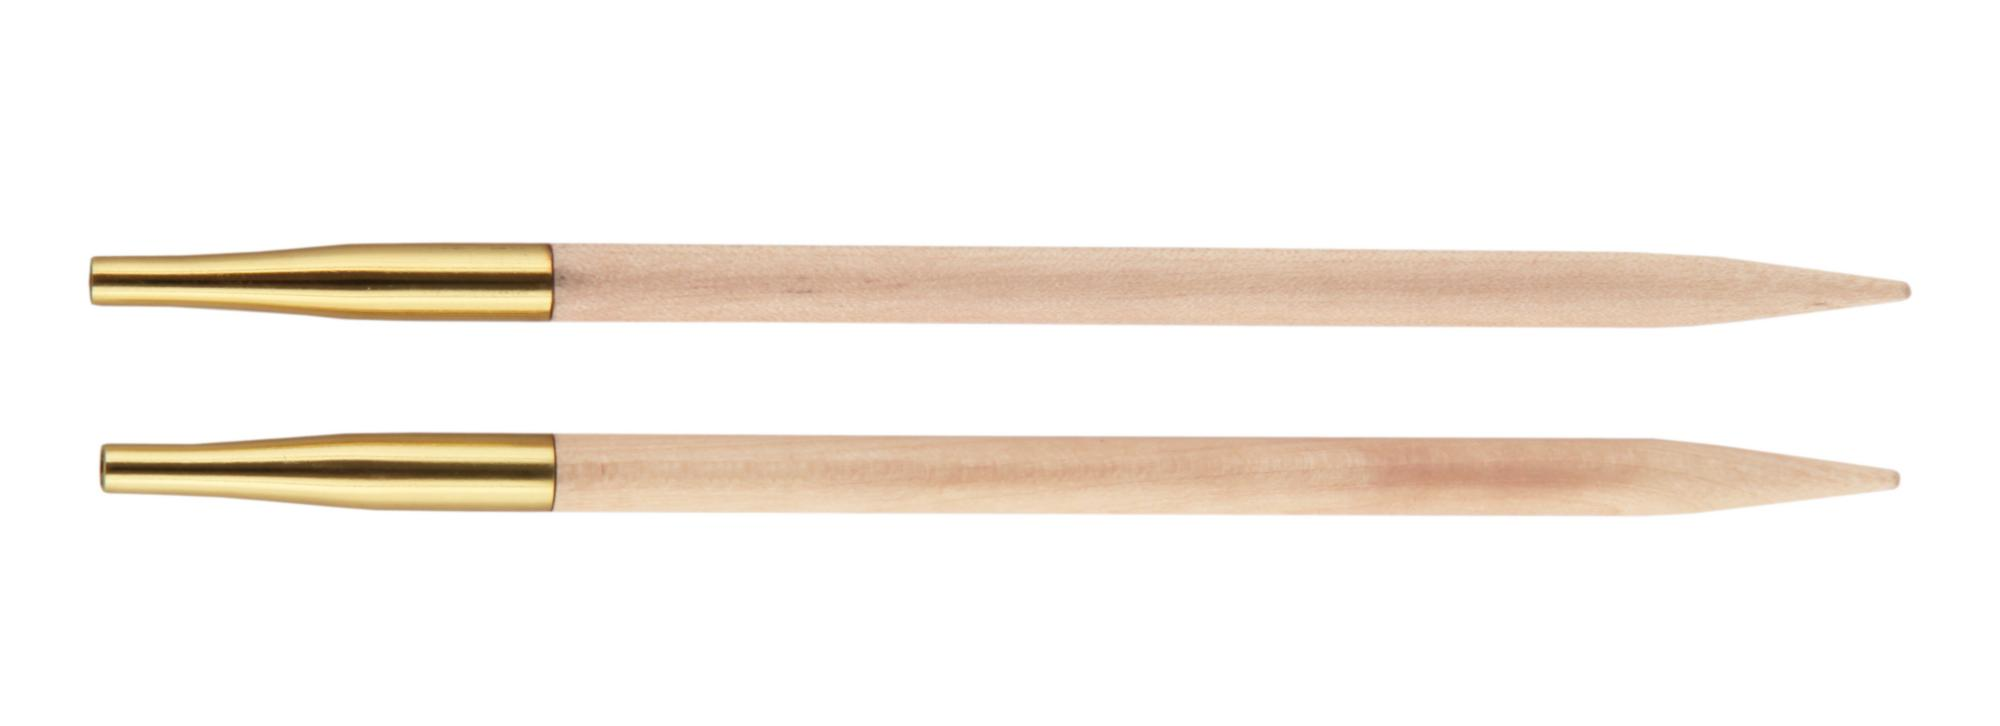 Спицы съемные короткие Basix Birch Wood KnitPro, 35654, 3.75 мм